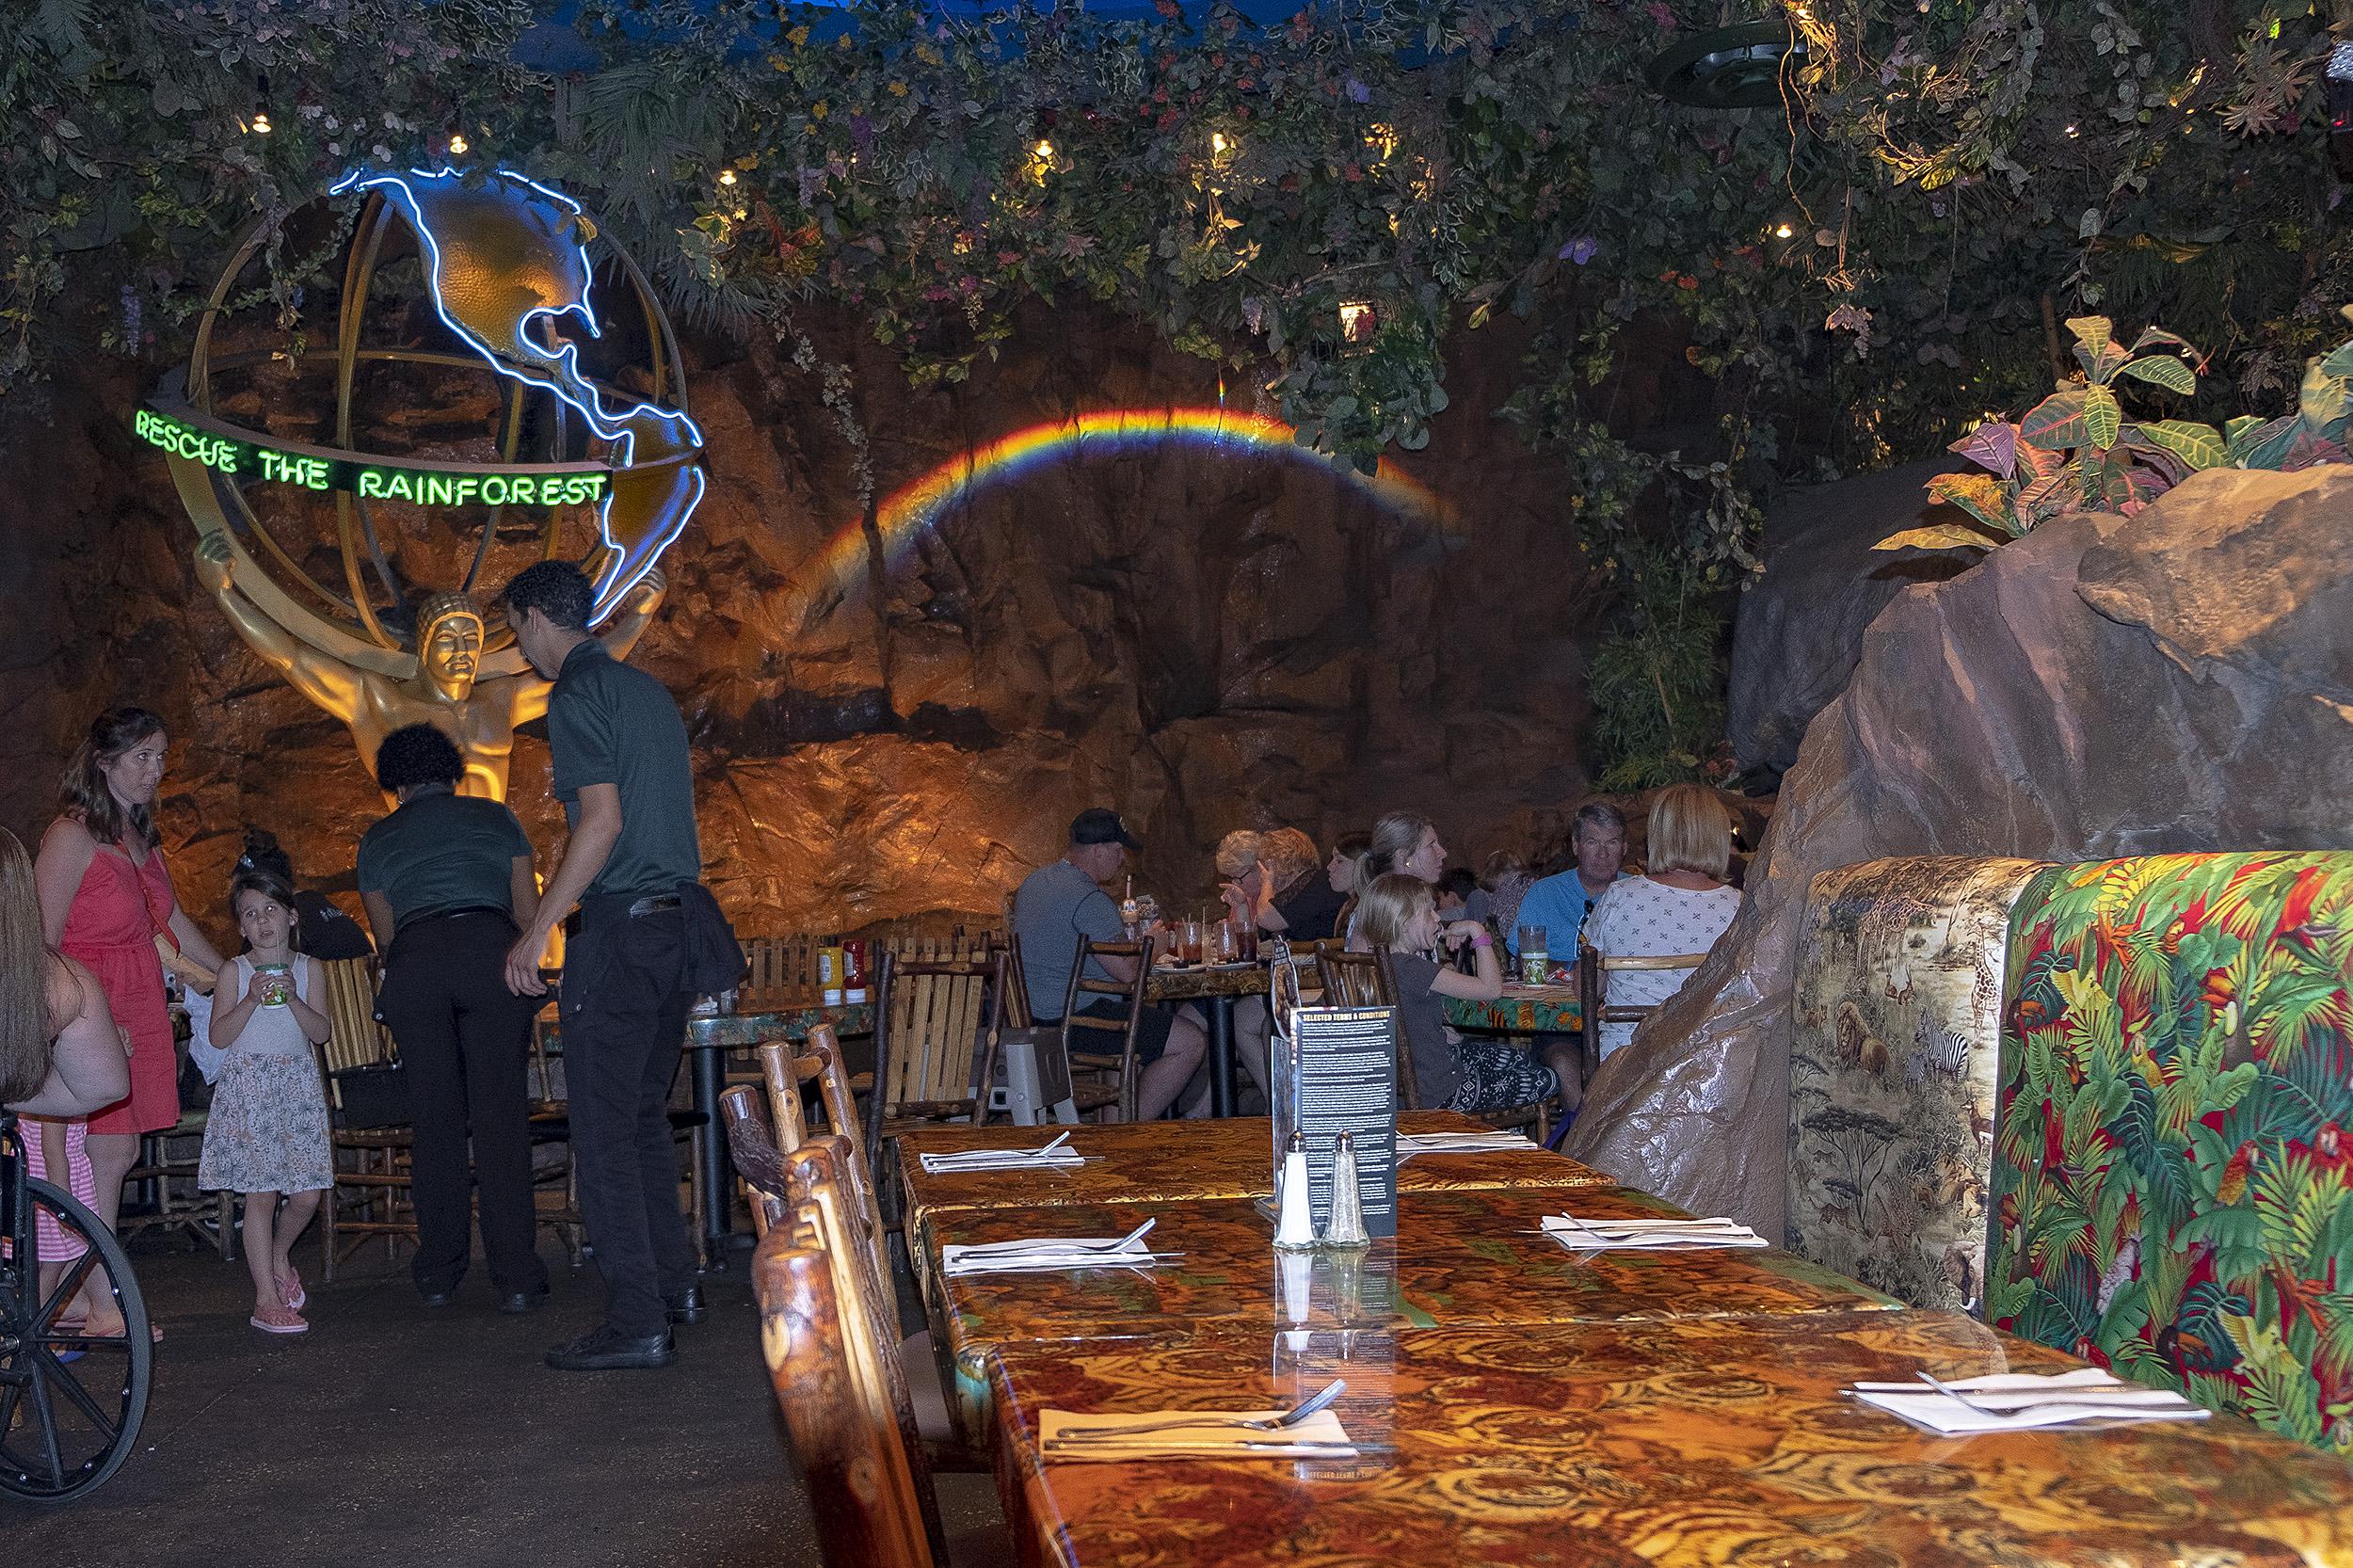 Disney Springs Rainforest cafe